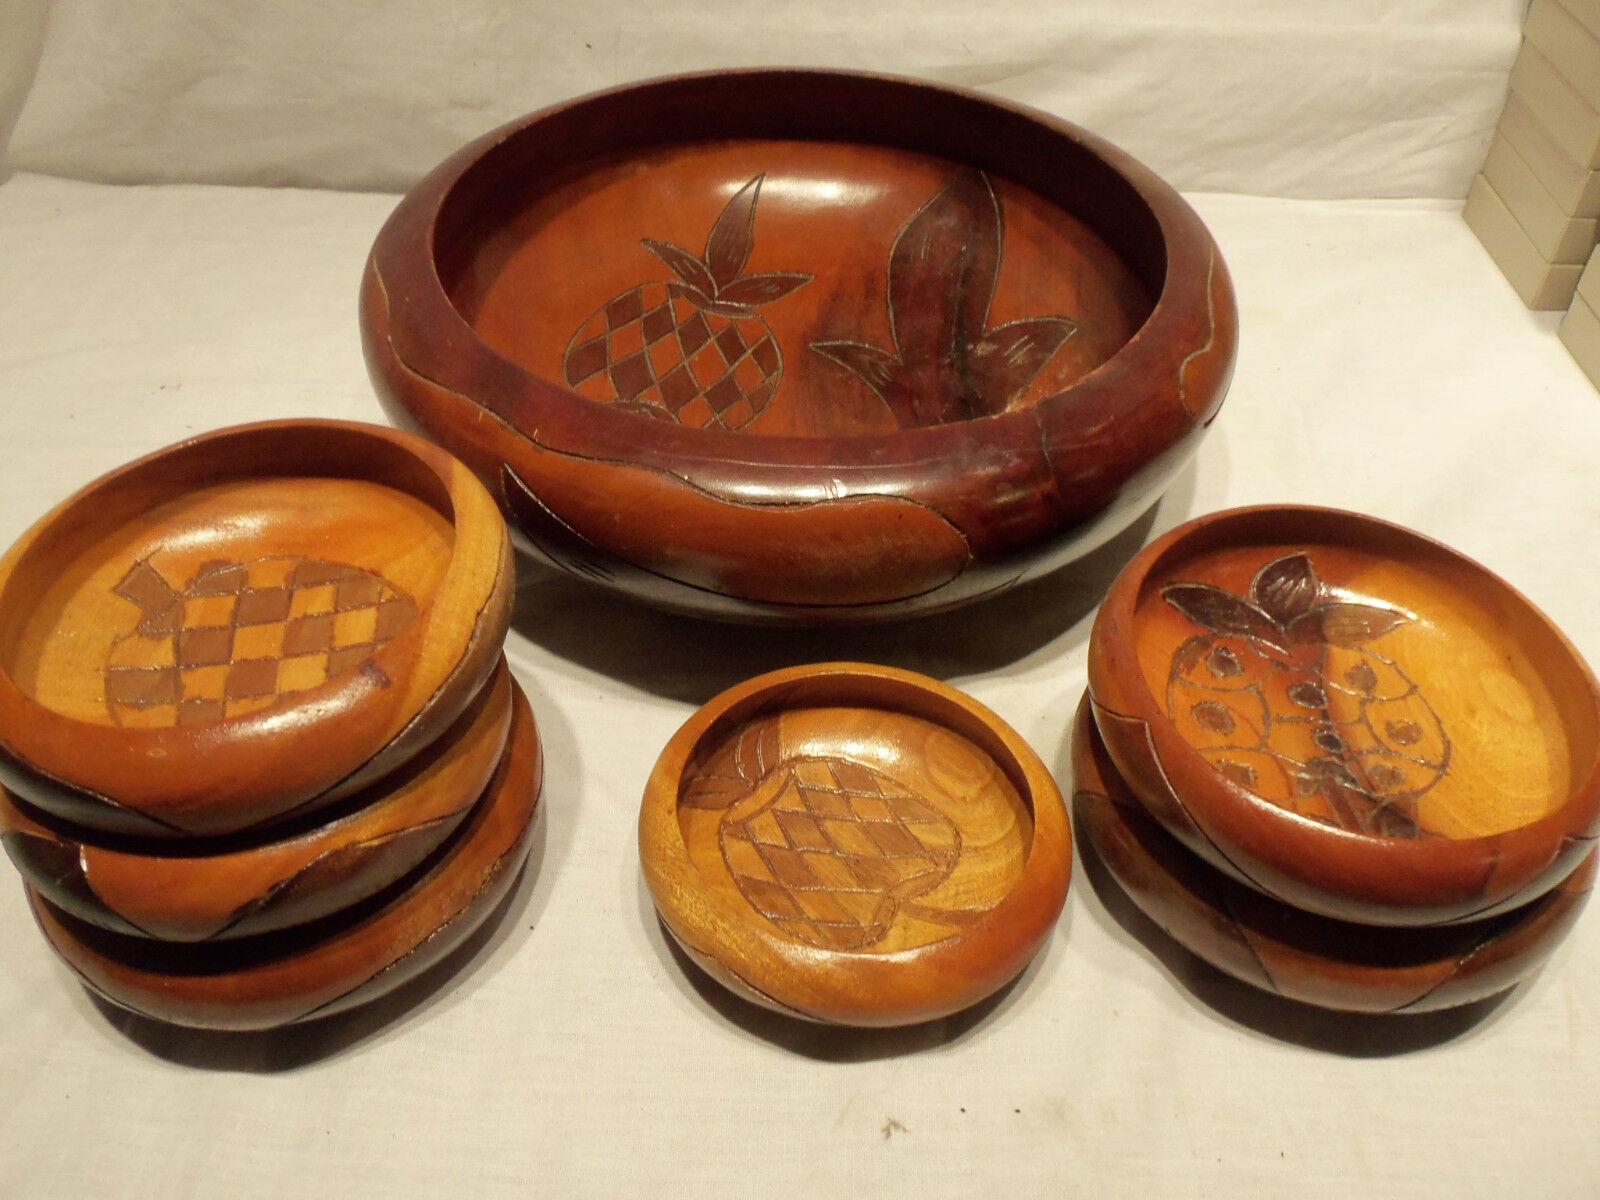 Vintage 7 pc Home Decor Handmade Engraved WOOD Salad Bowl Kitchen Dining Set